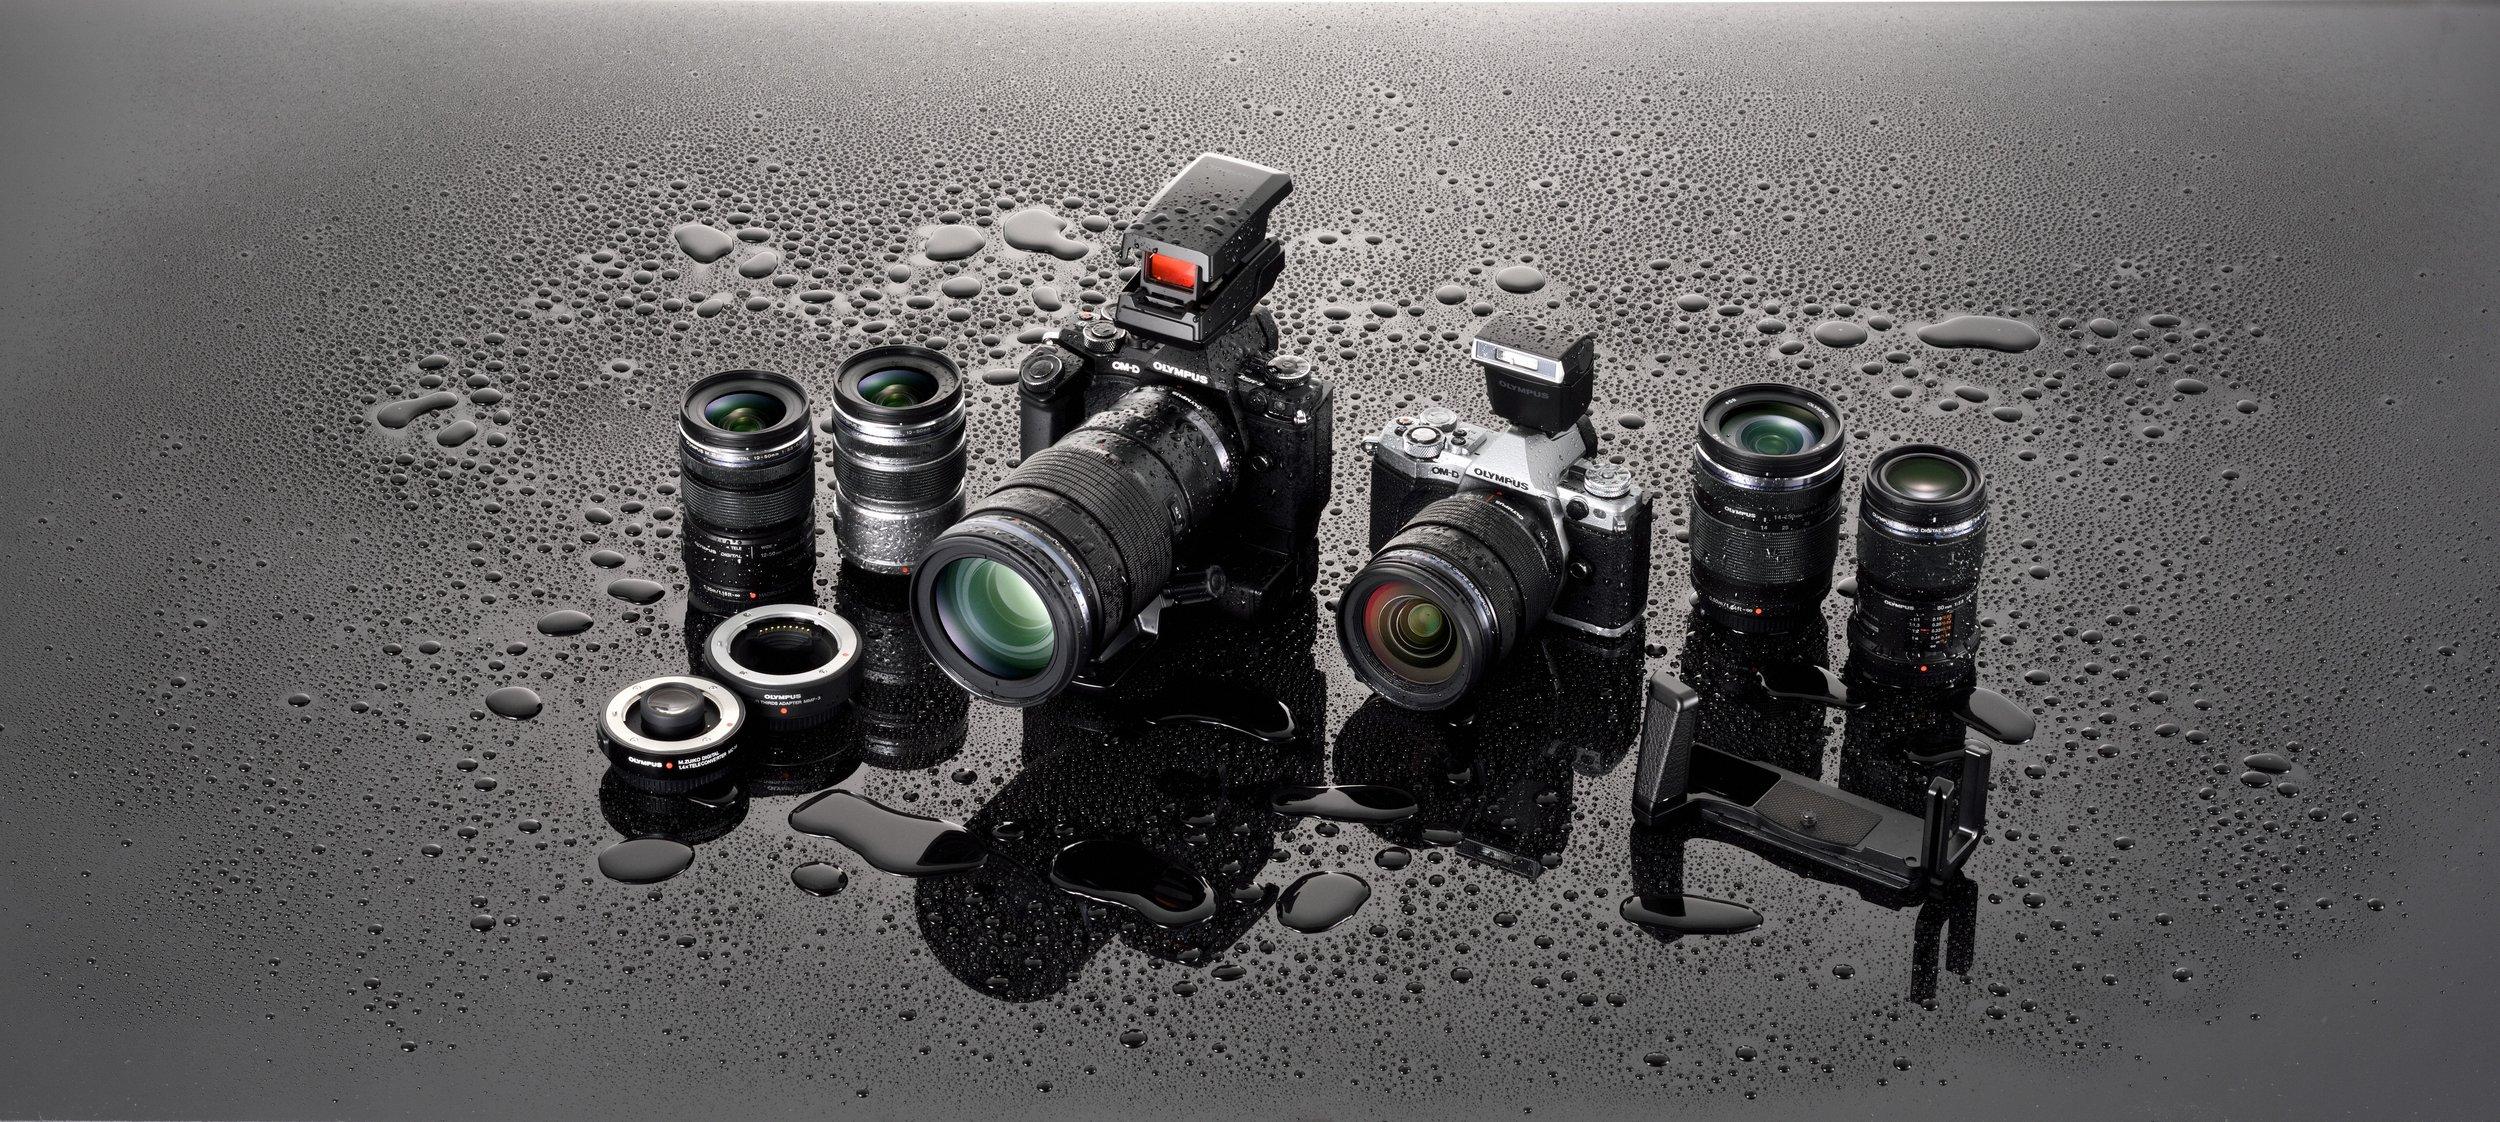 Olympus EM5 Mark II & select M.Zuiko Lenses are splashproof, dustproof, & freeze proof.